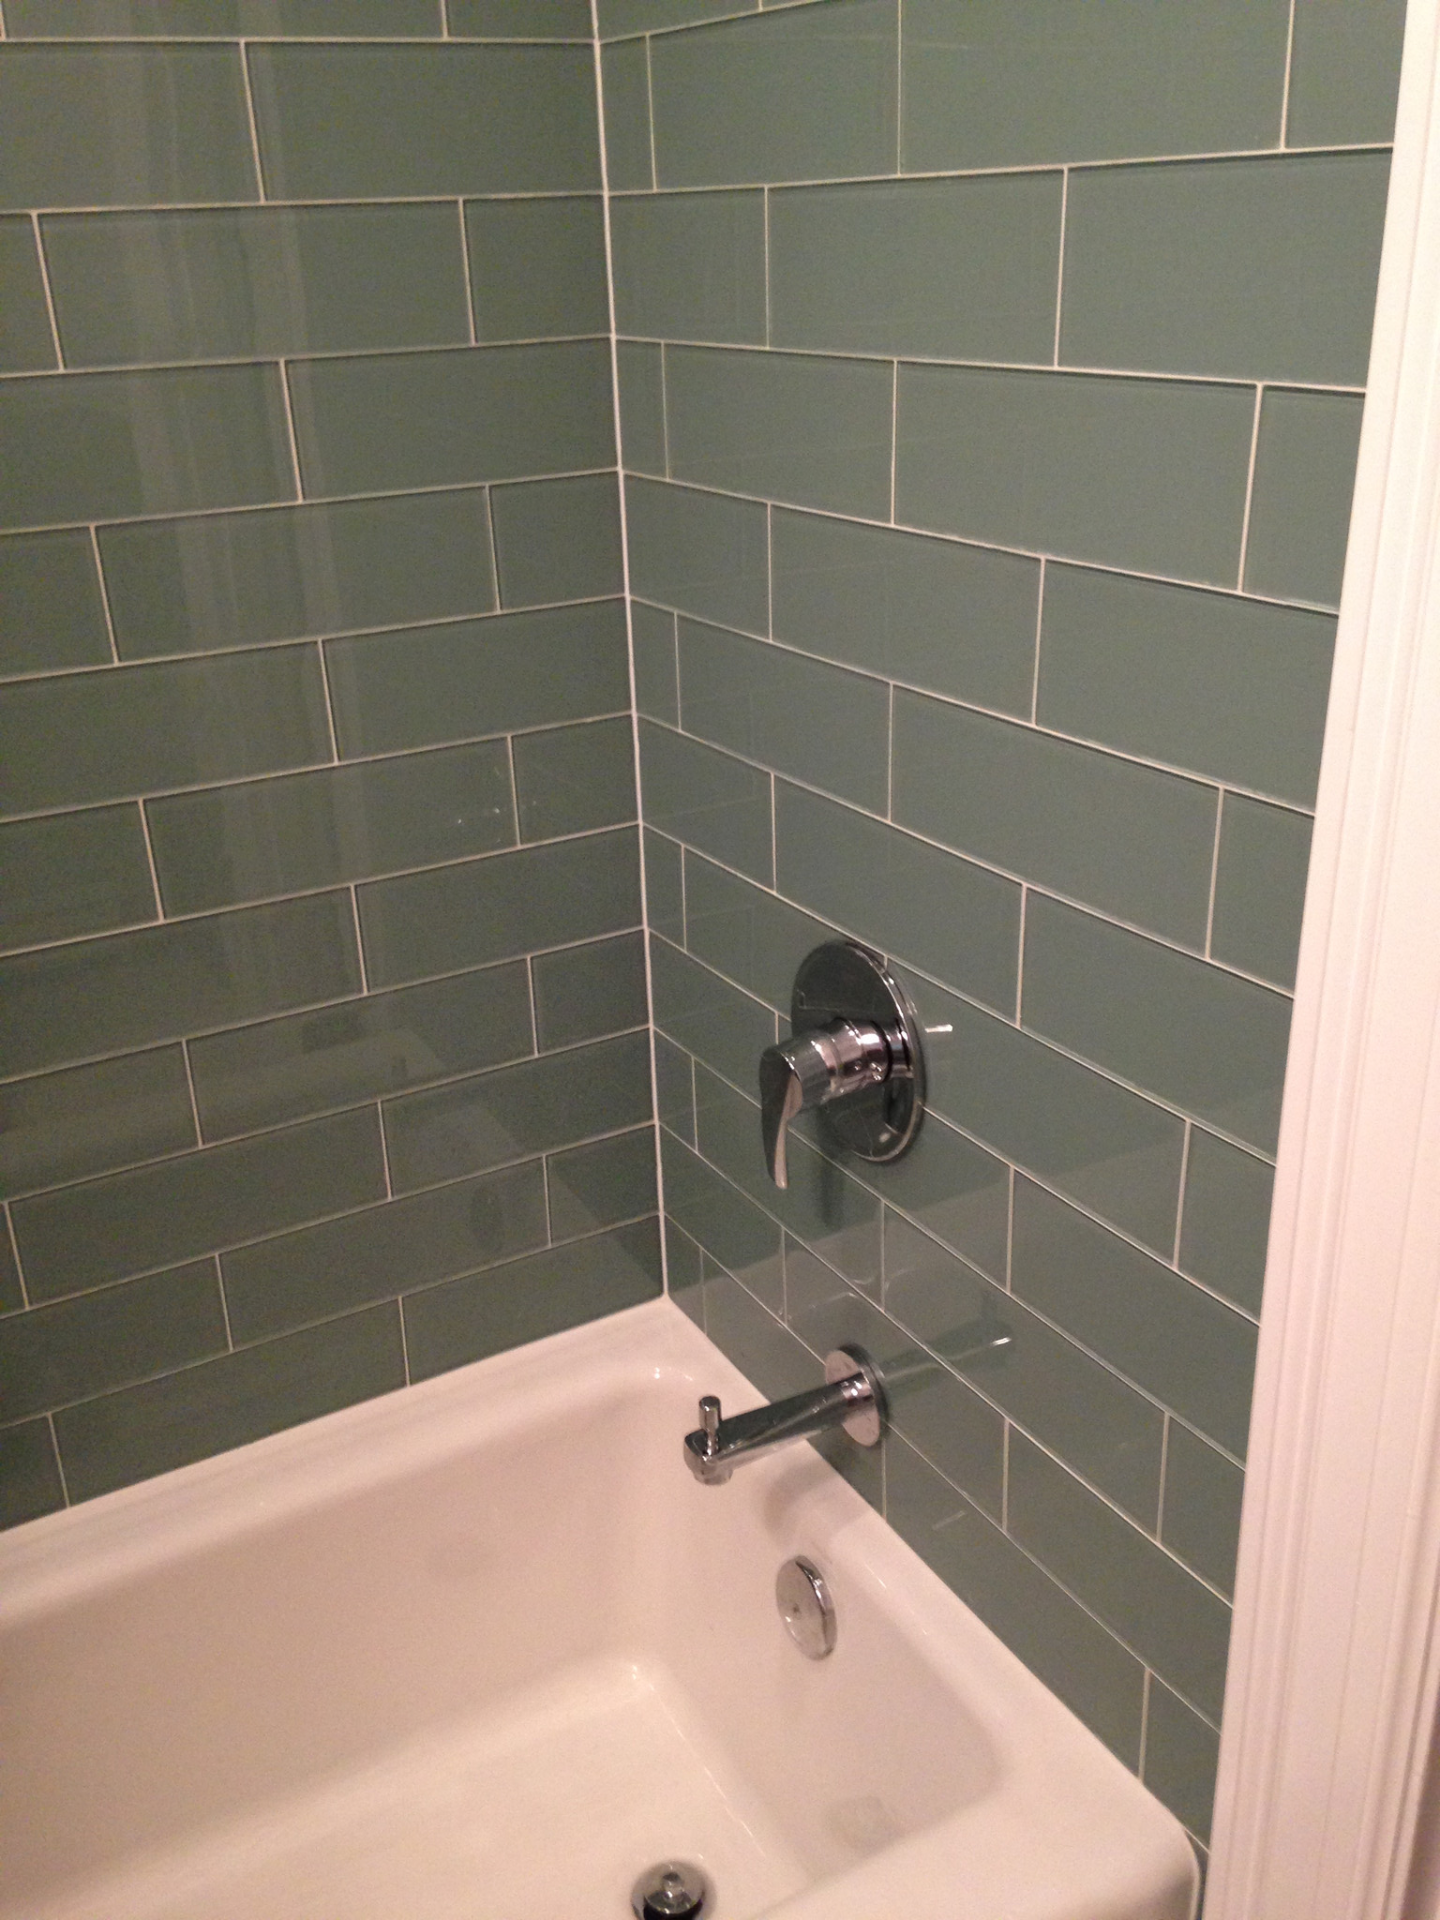 Bathroom tile online - Explore Glass Subway Tile Glass Mosaic Tiles And More